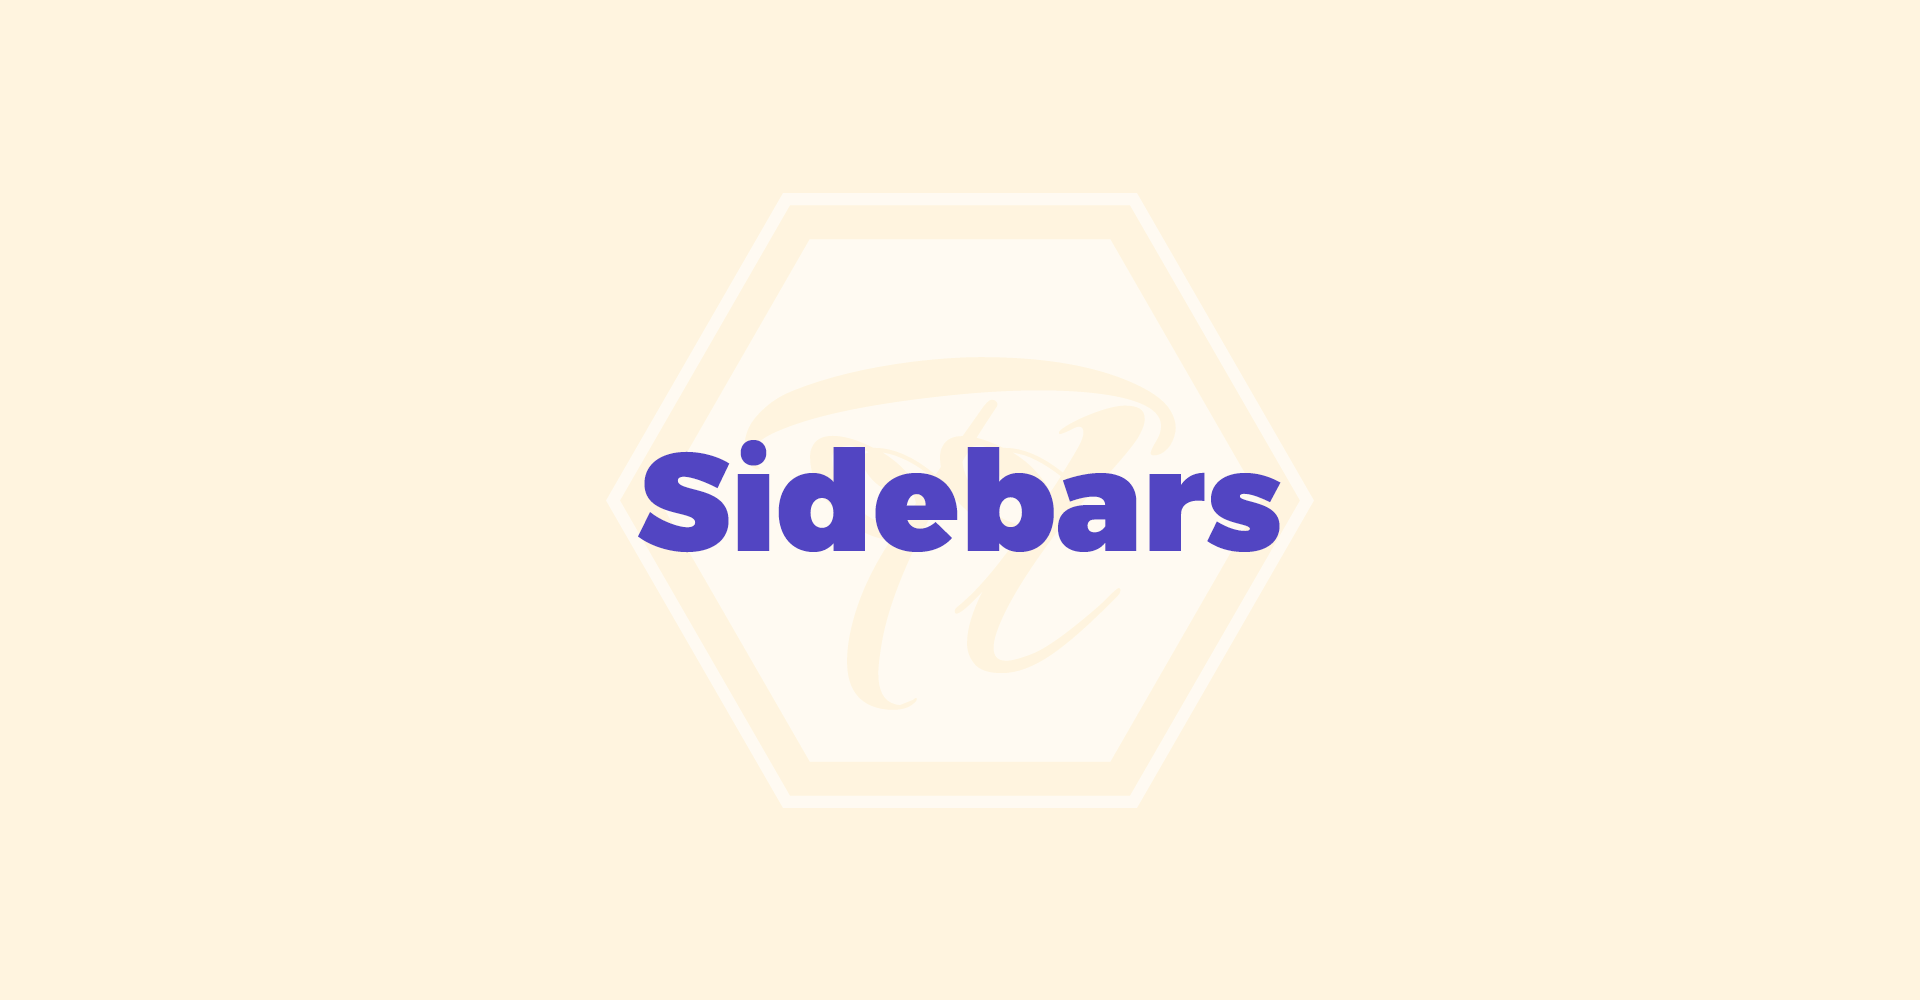 sidebars 1 1 2